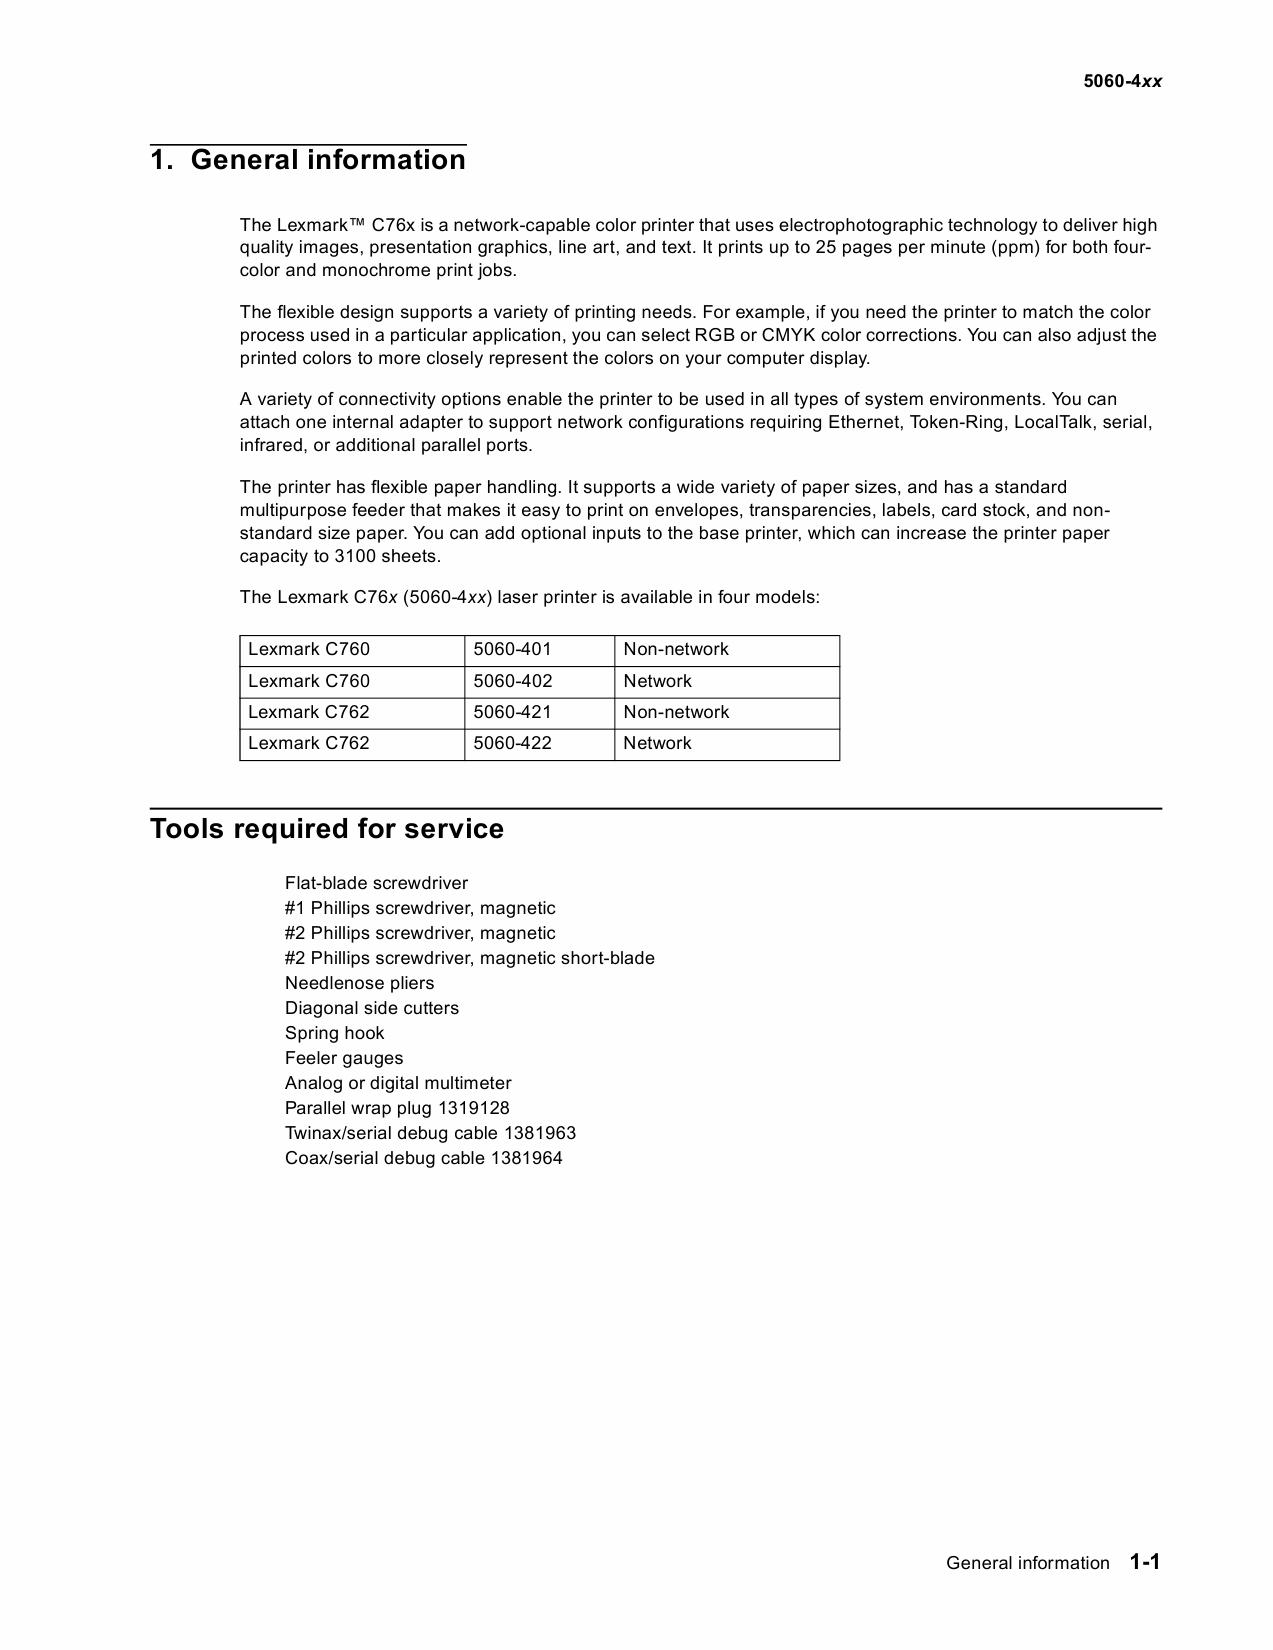 Lexmark C C760 C762 5060 Service Manual-2